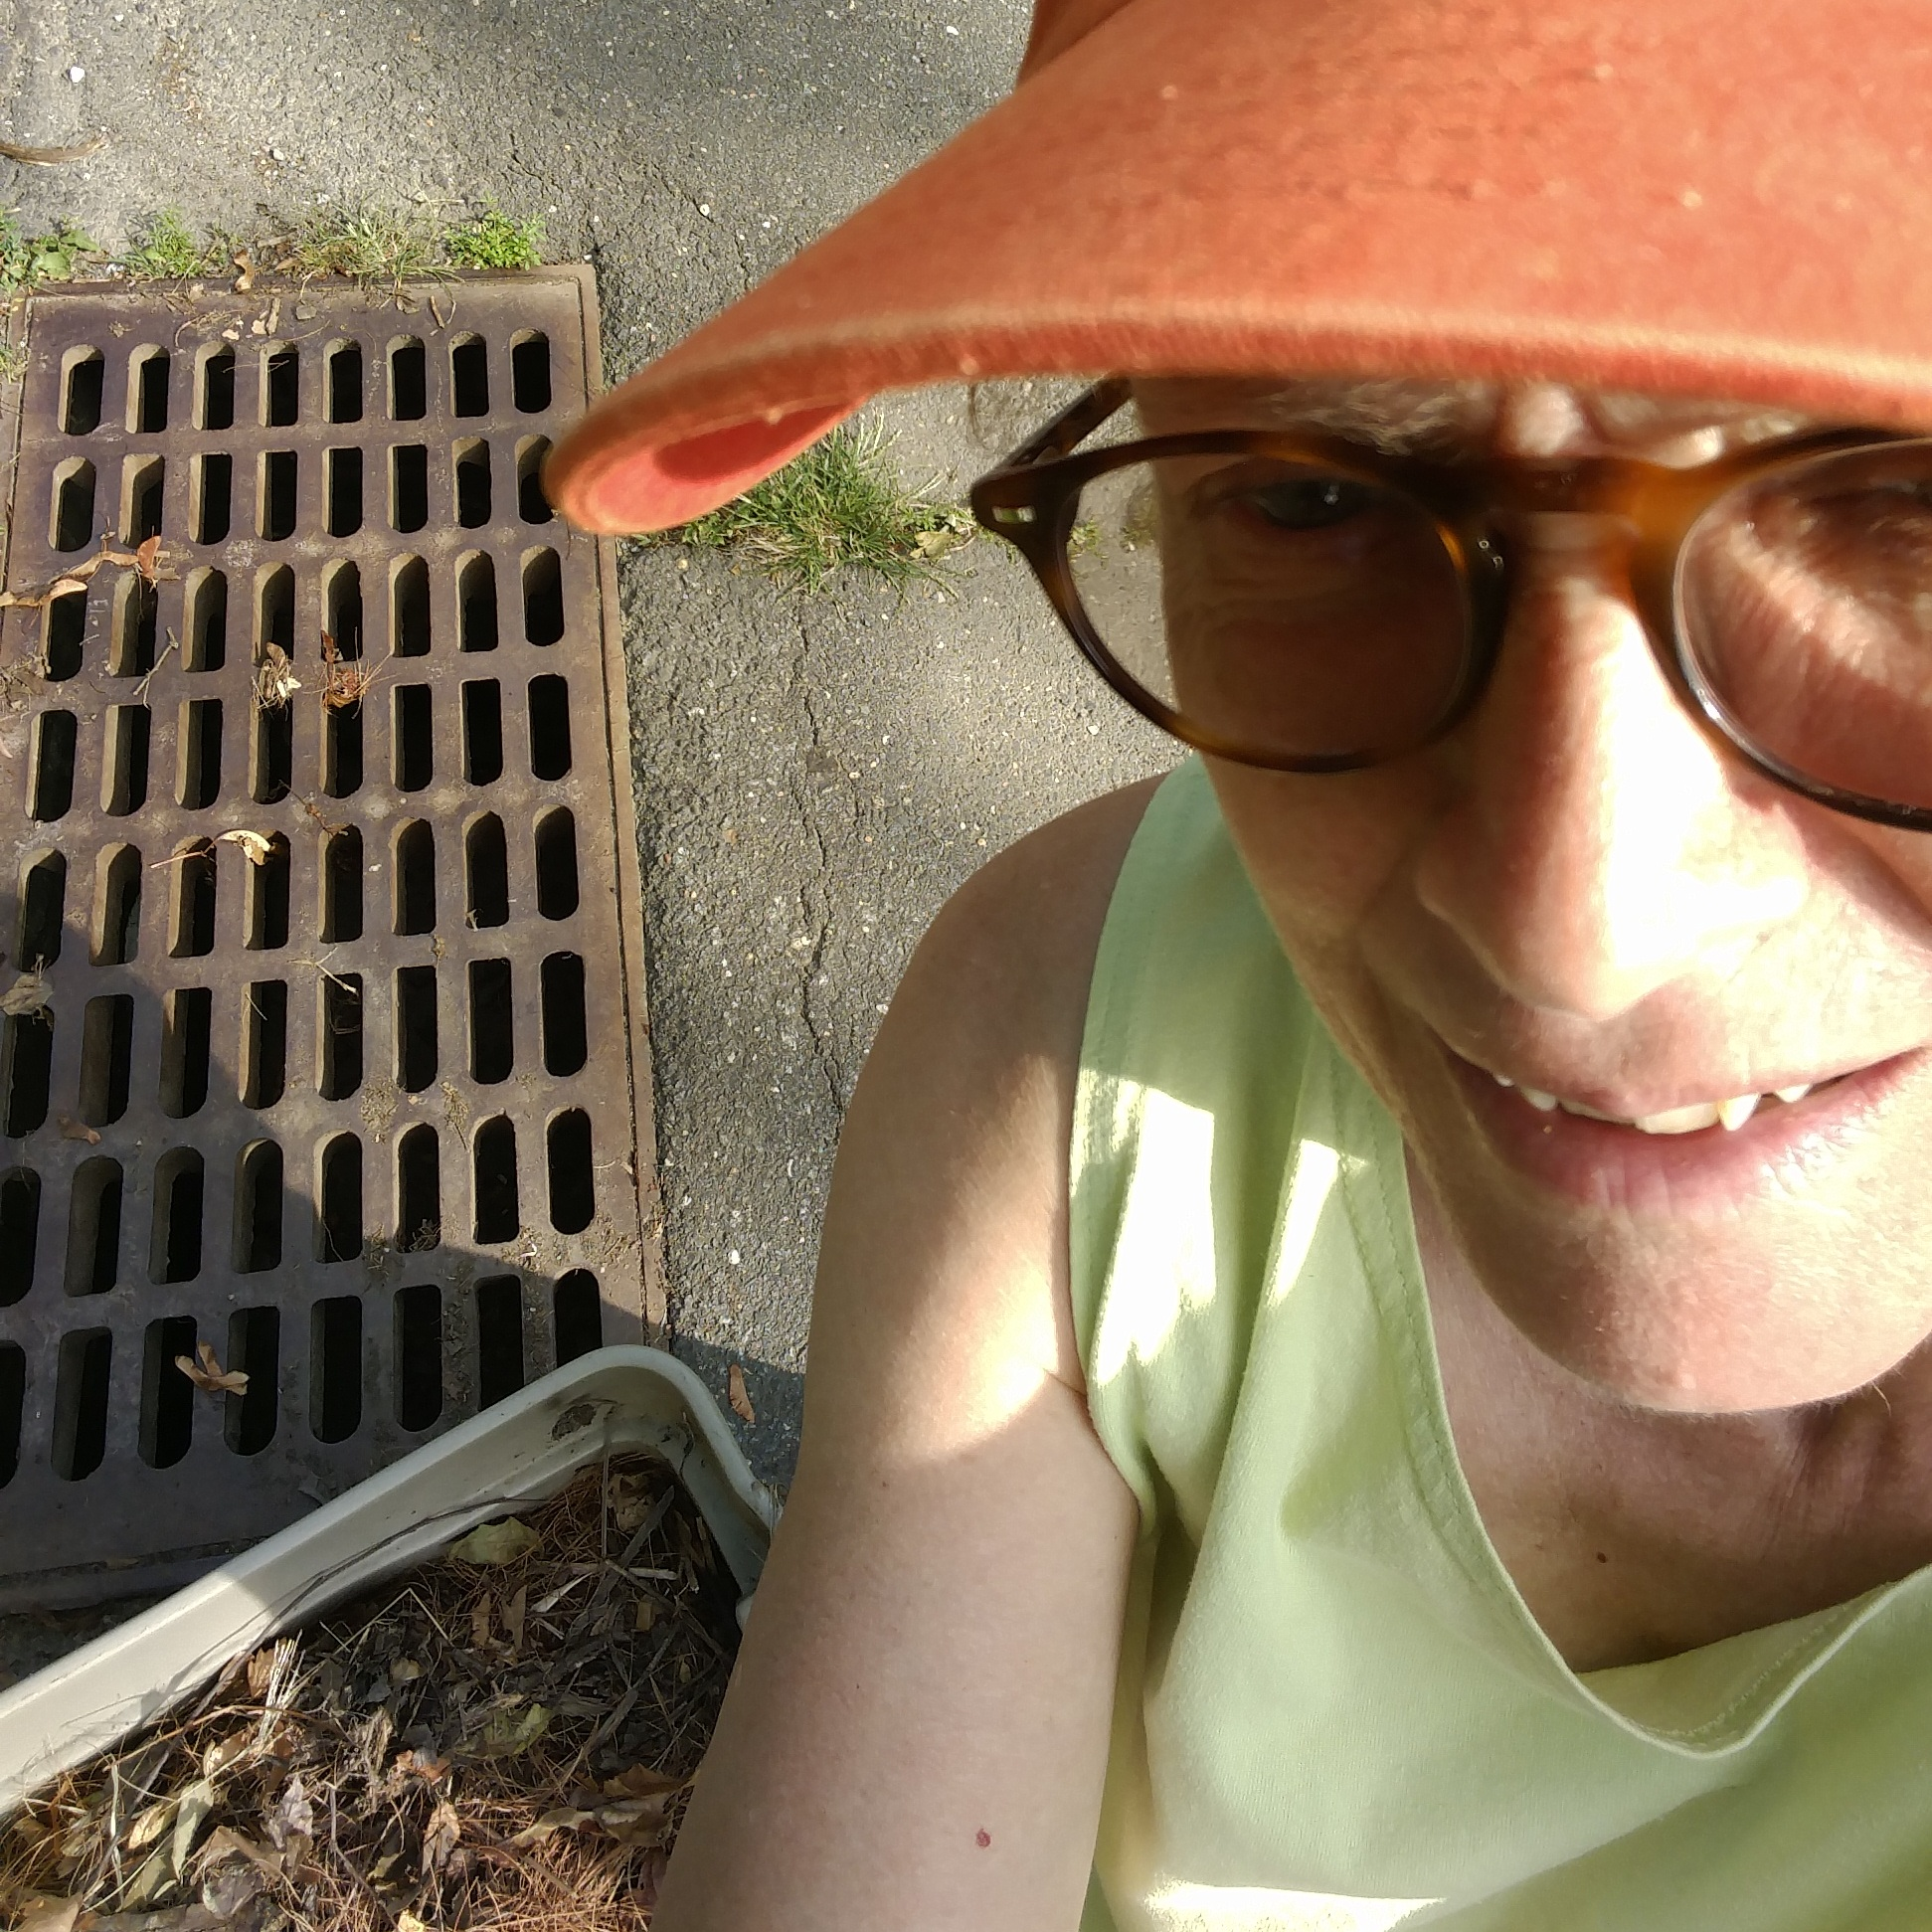 Many thanks to Eliane and her neighbors in the Walnut-Dempsey-Cuyler neighborhood!